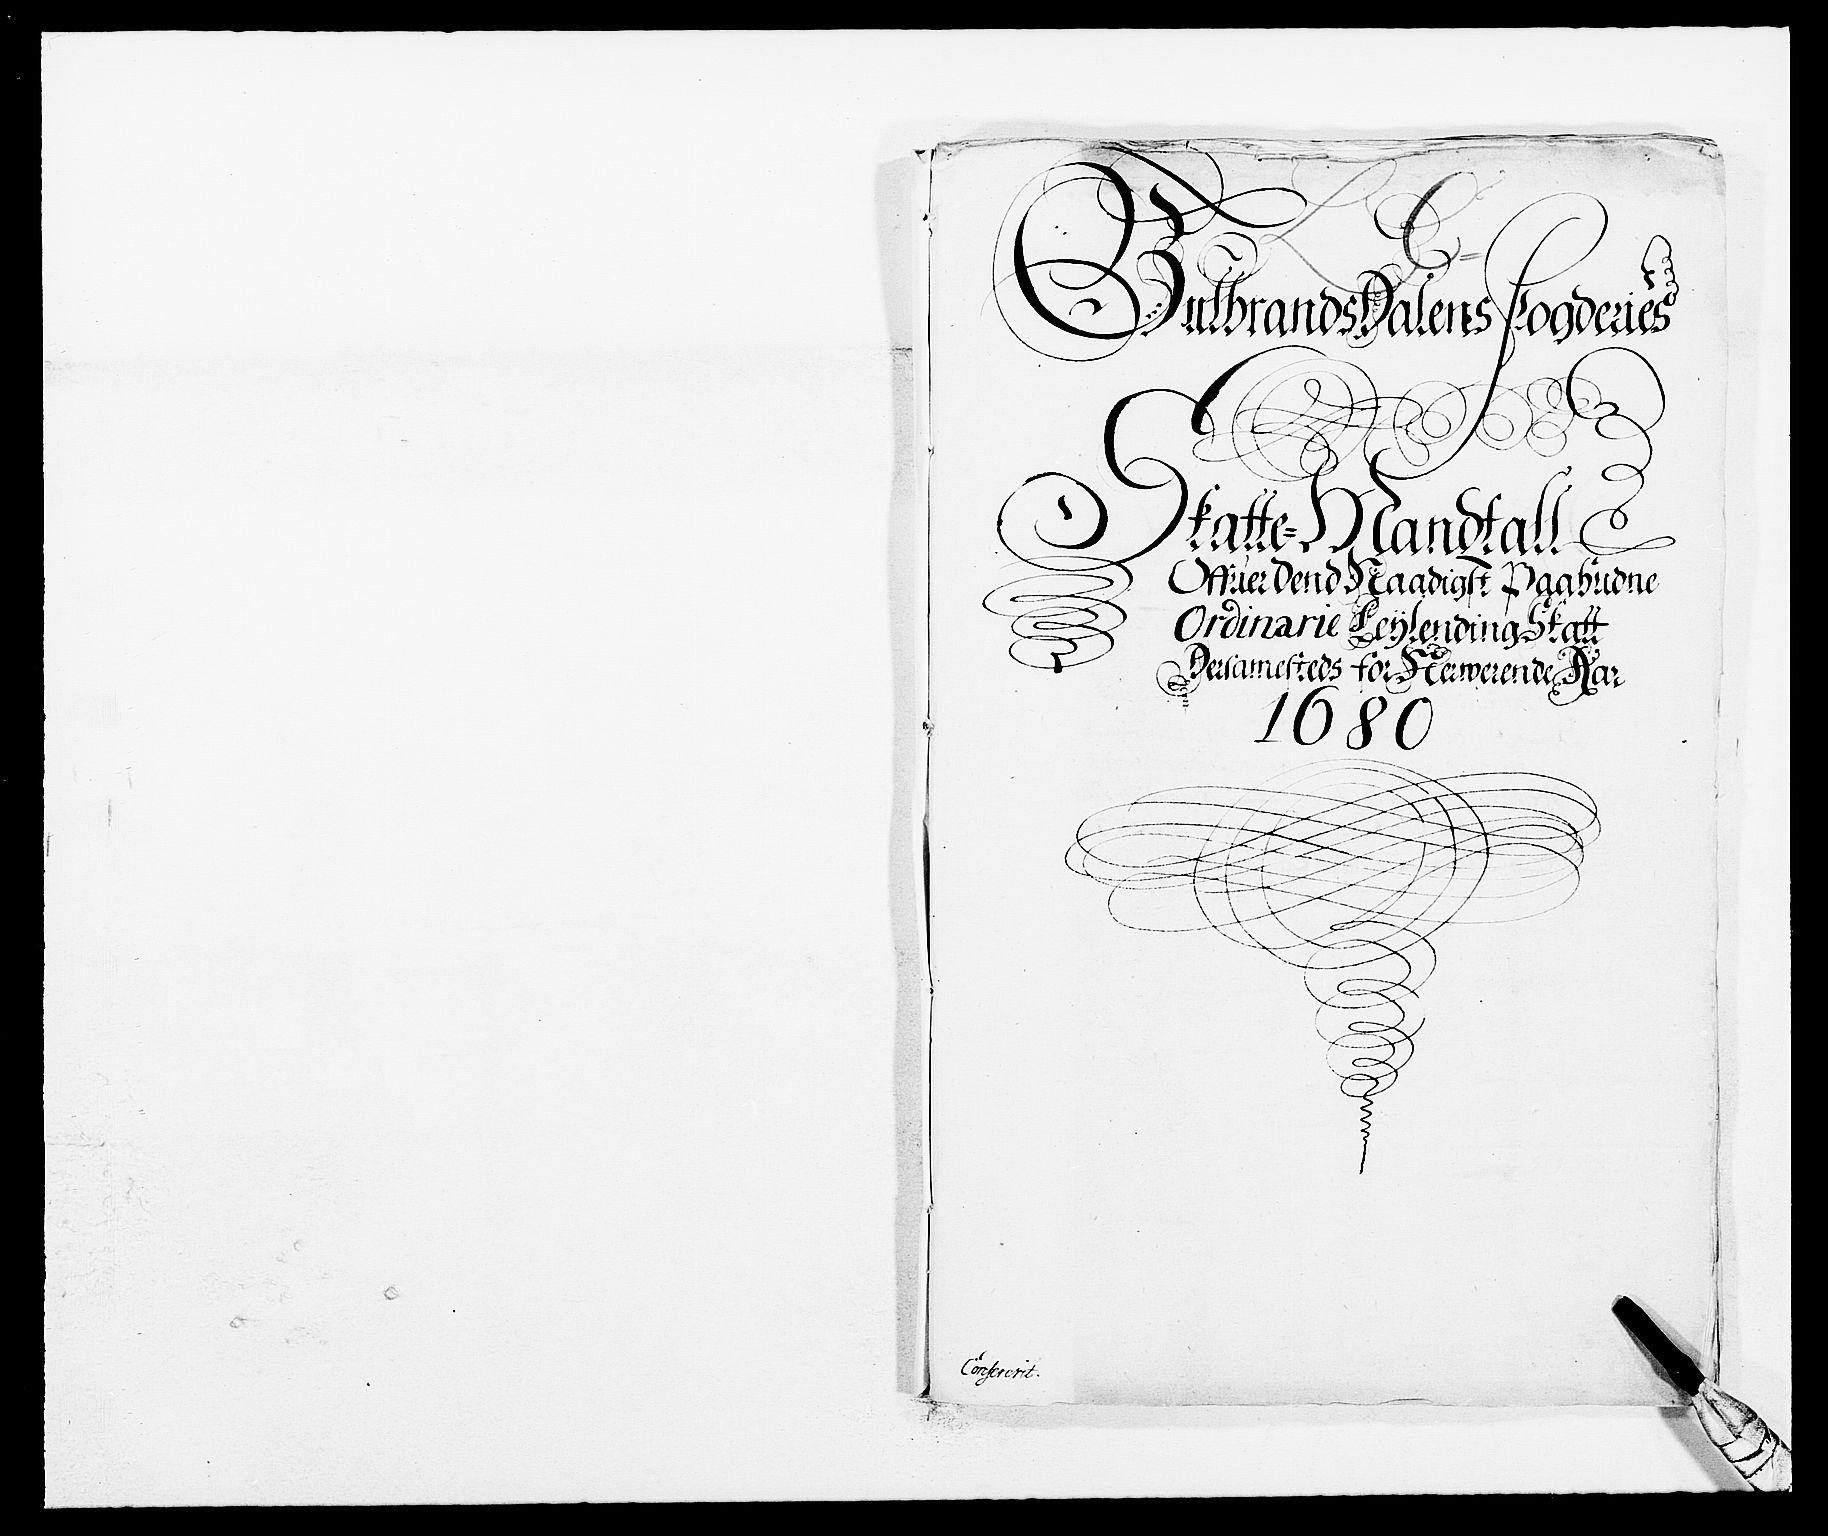 RA, Rentekammeret inntil 1814, Reviderte regnskaper, Fogderegnskap, R17/L1154: Fogderegnskap Gudbrandsdal, 1680, s. 261